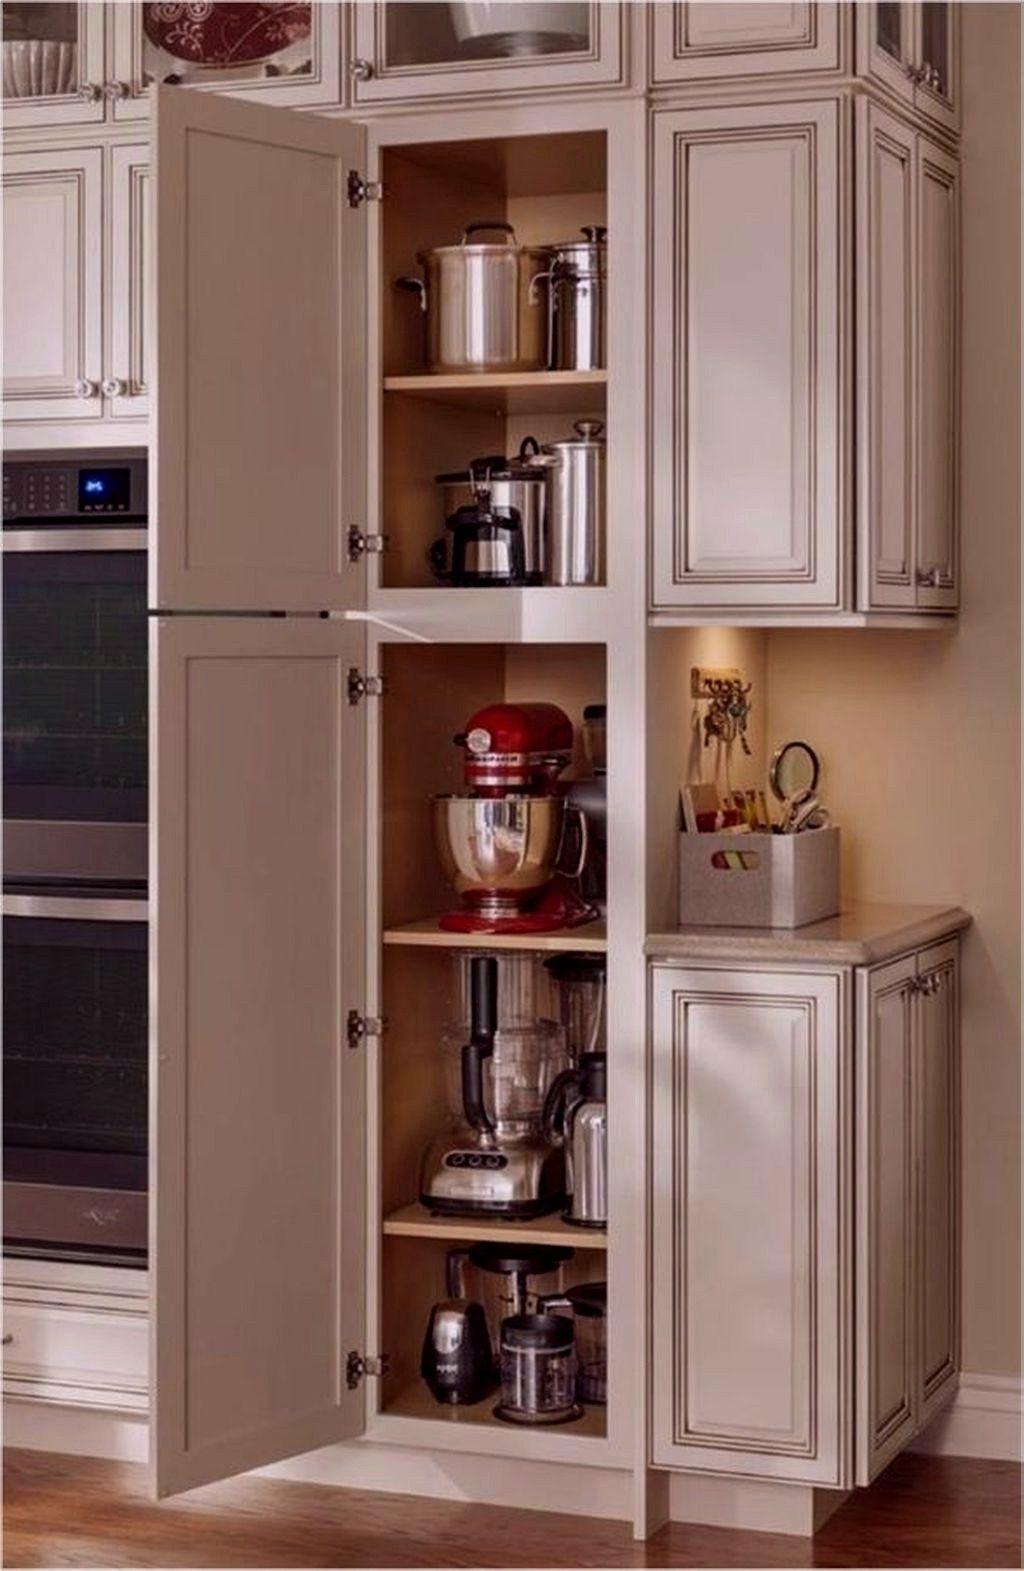 26 Best Kitchen Decor Design Or Remodel Ideas That Will Inspire